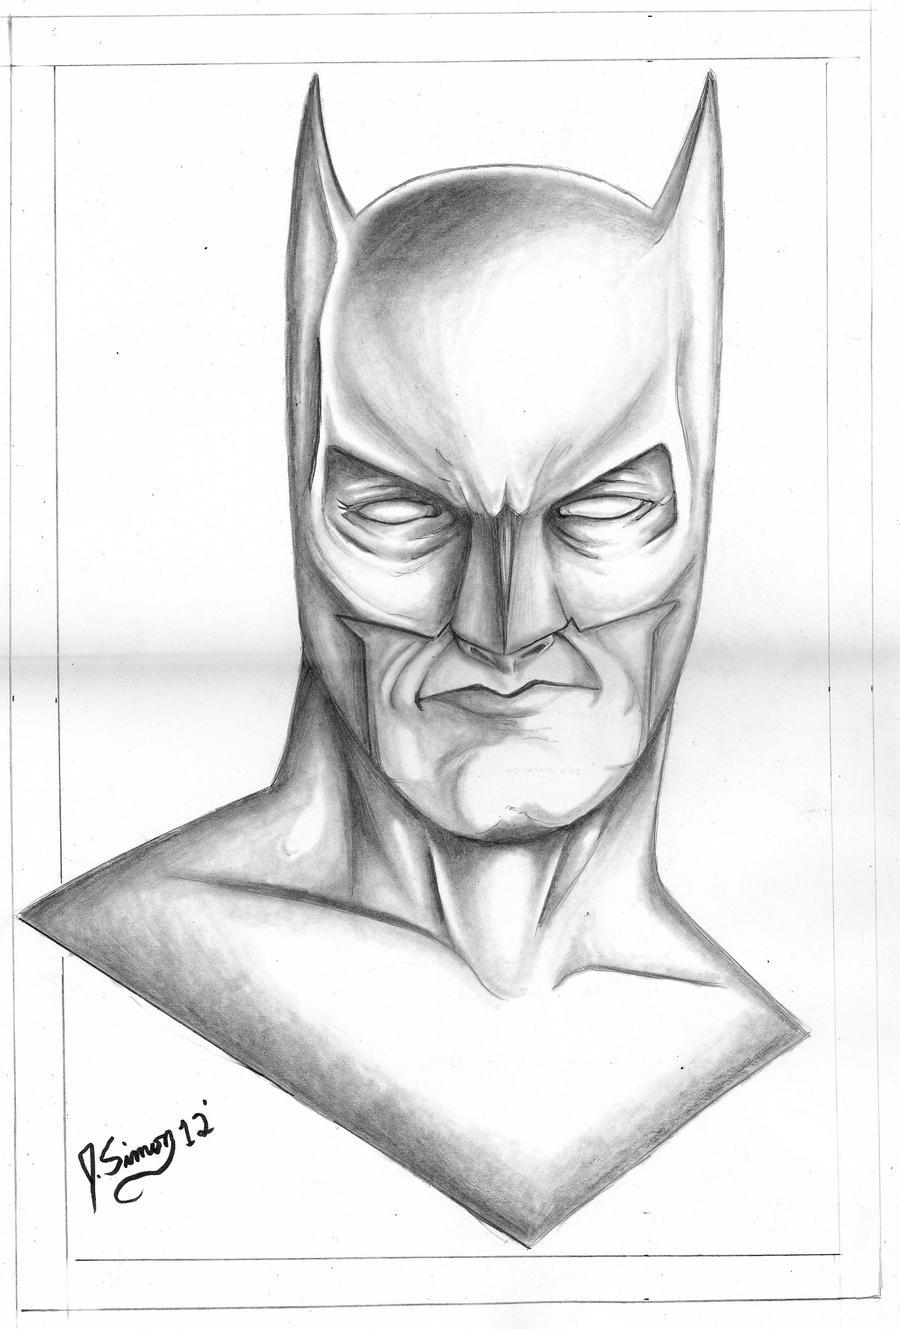 Batman Pencil drawing by JSimonART on DeviantArt